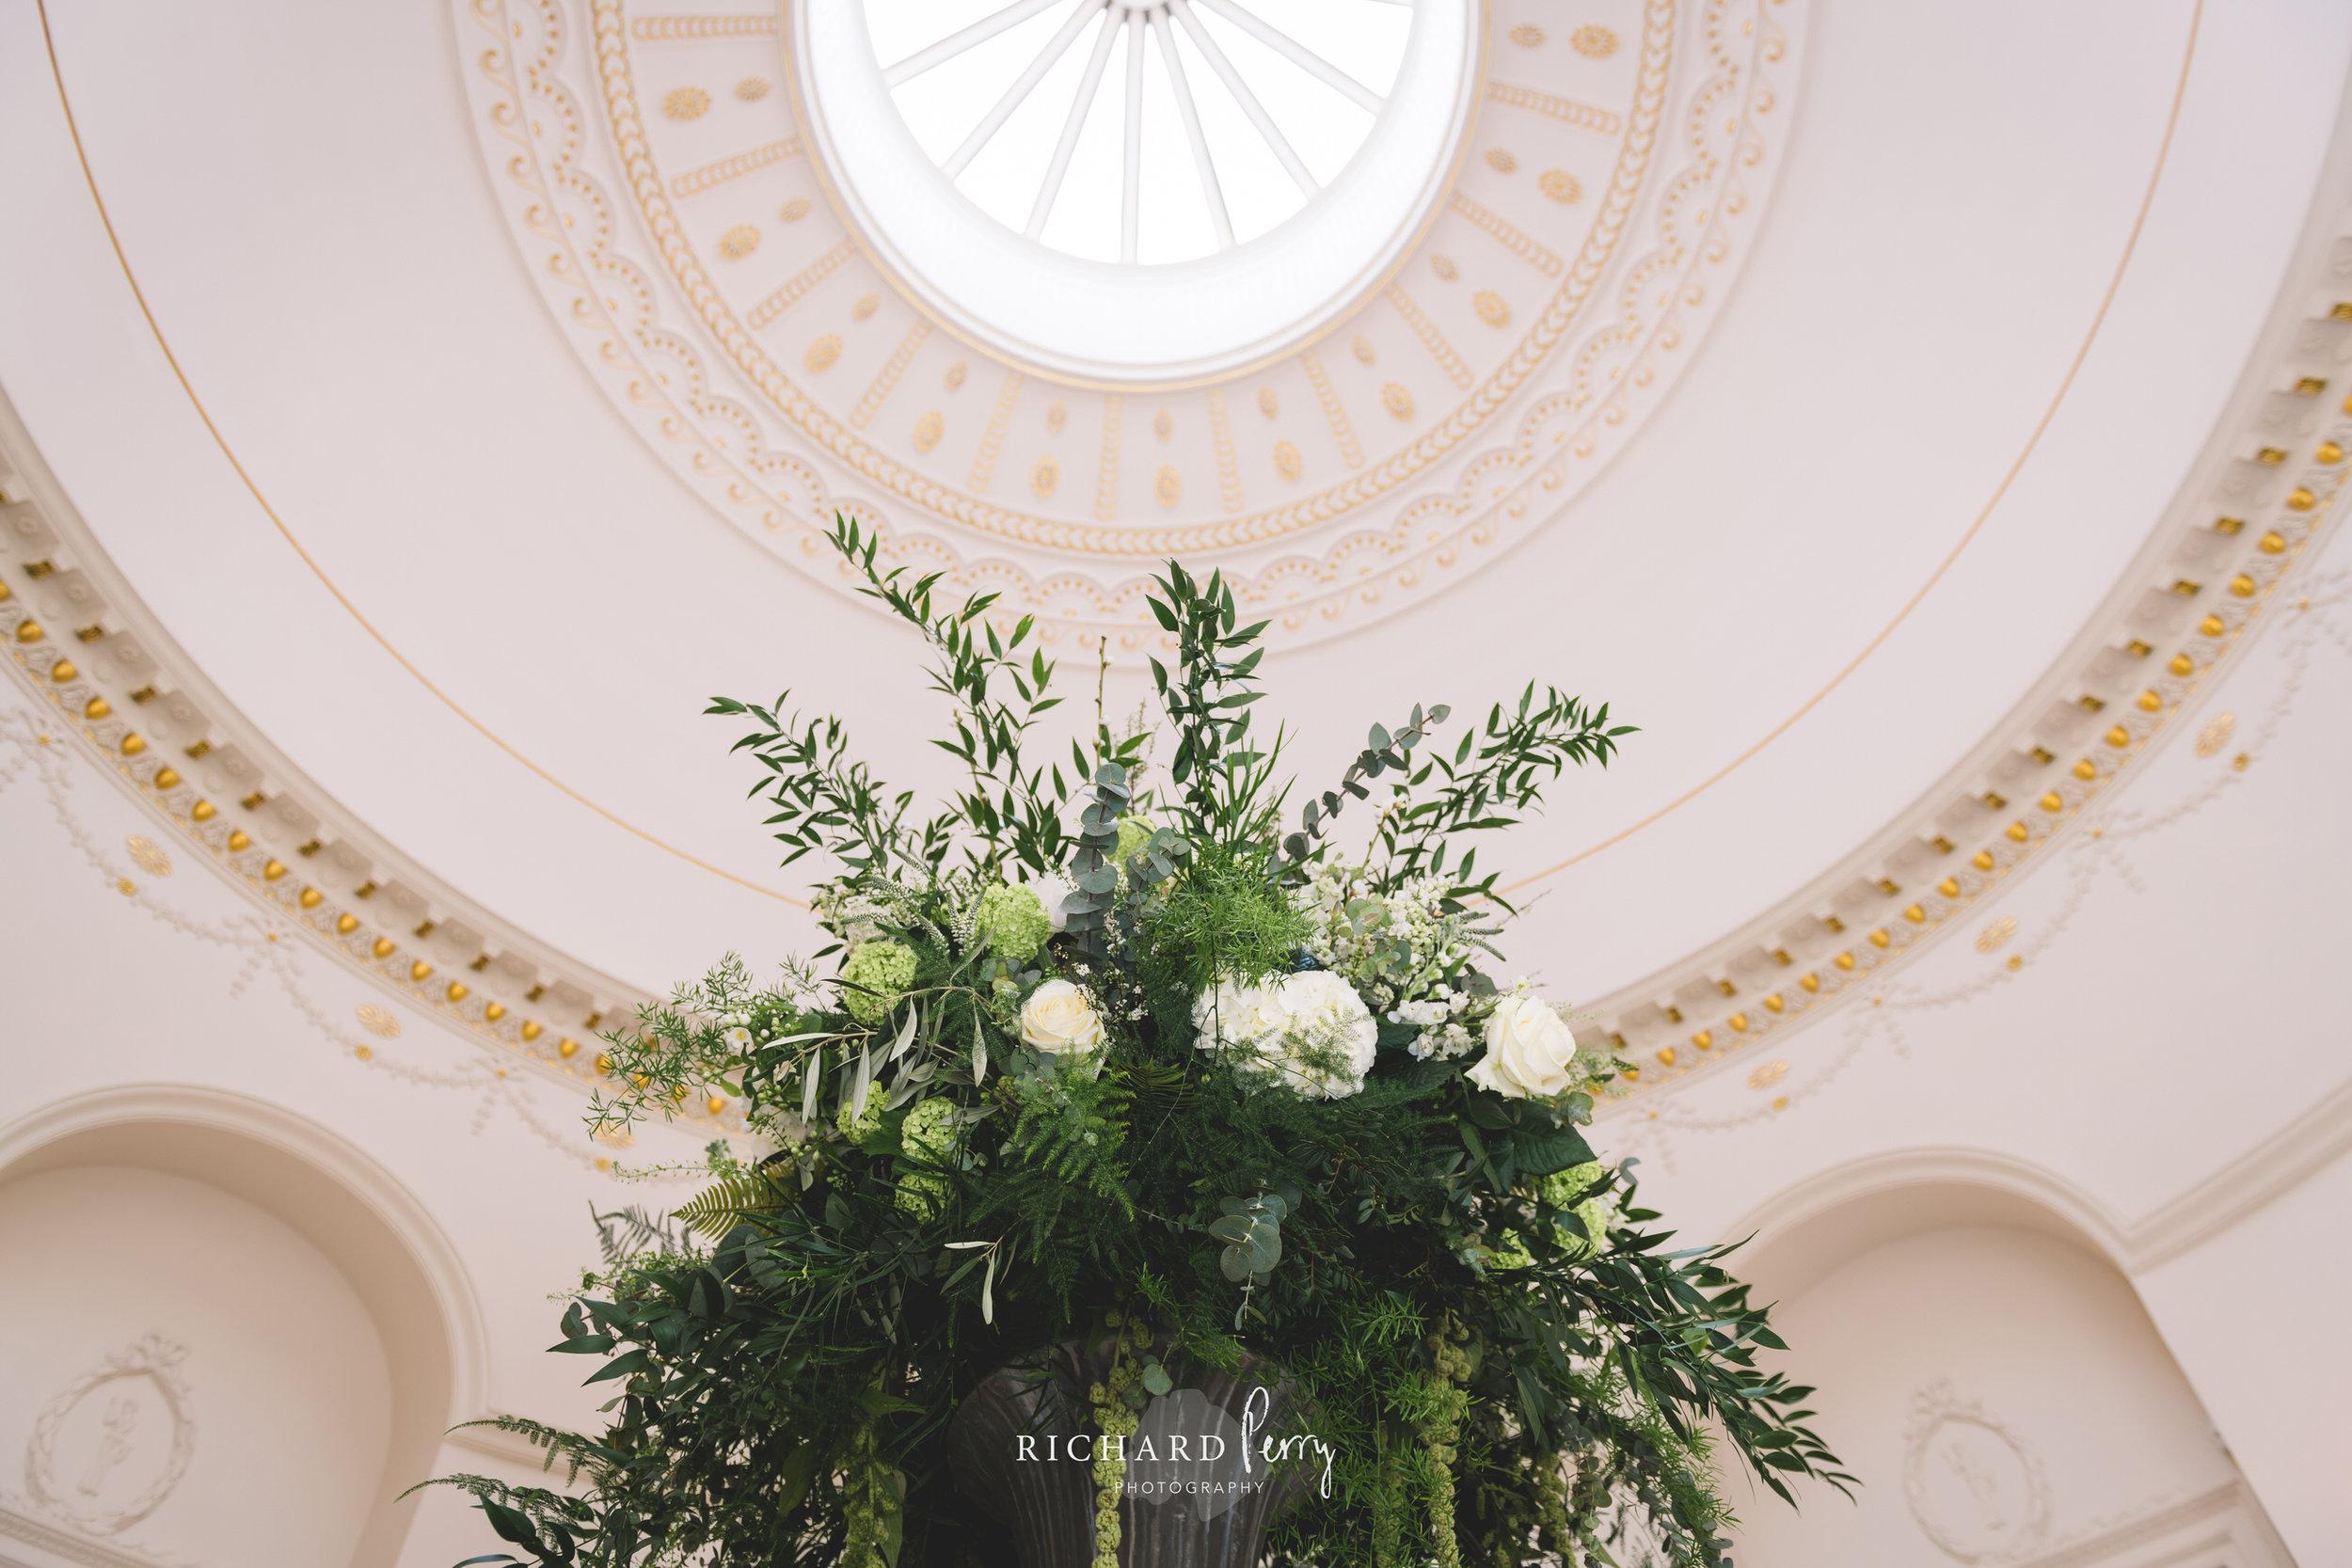 yorkshire-wedding-photographer-destination-archerfield-house-3.jpg